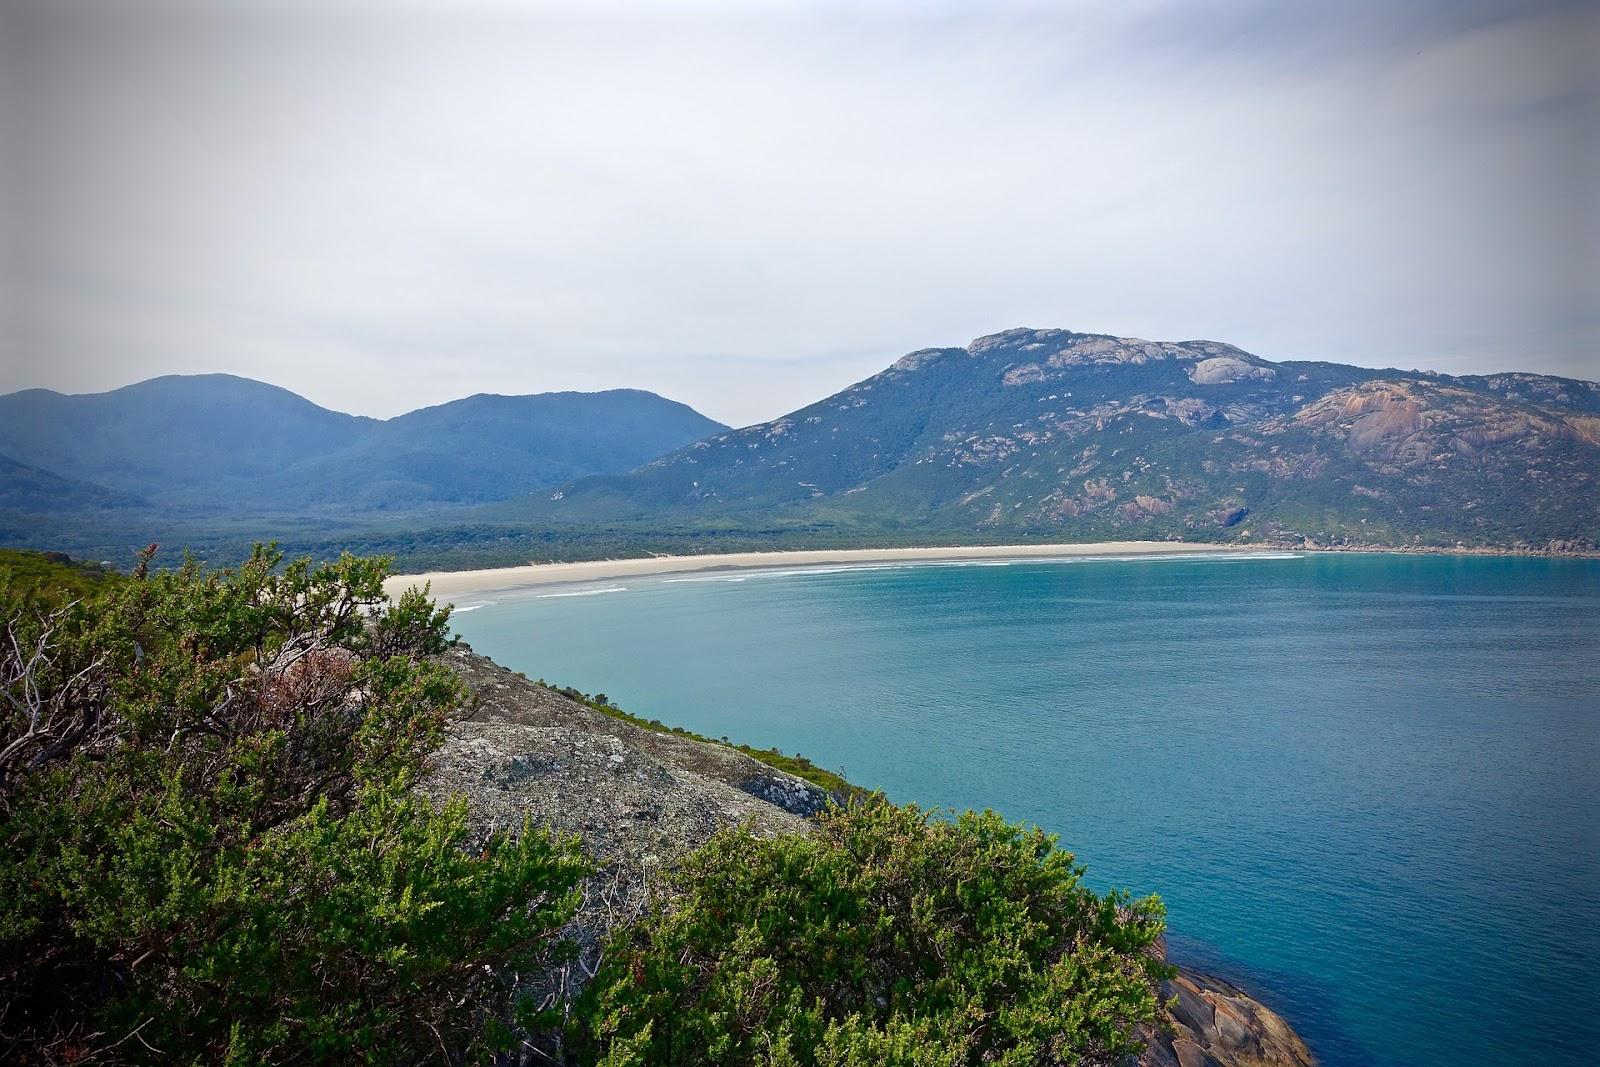 wilsons promontory national park sand beach turquoise ocean australia